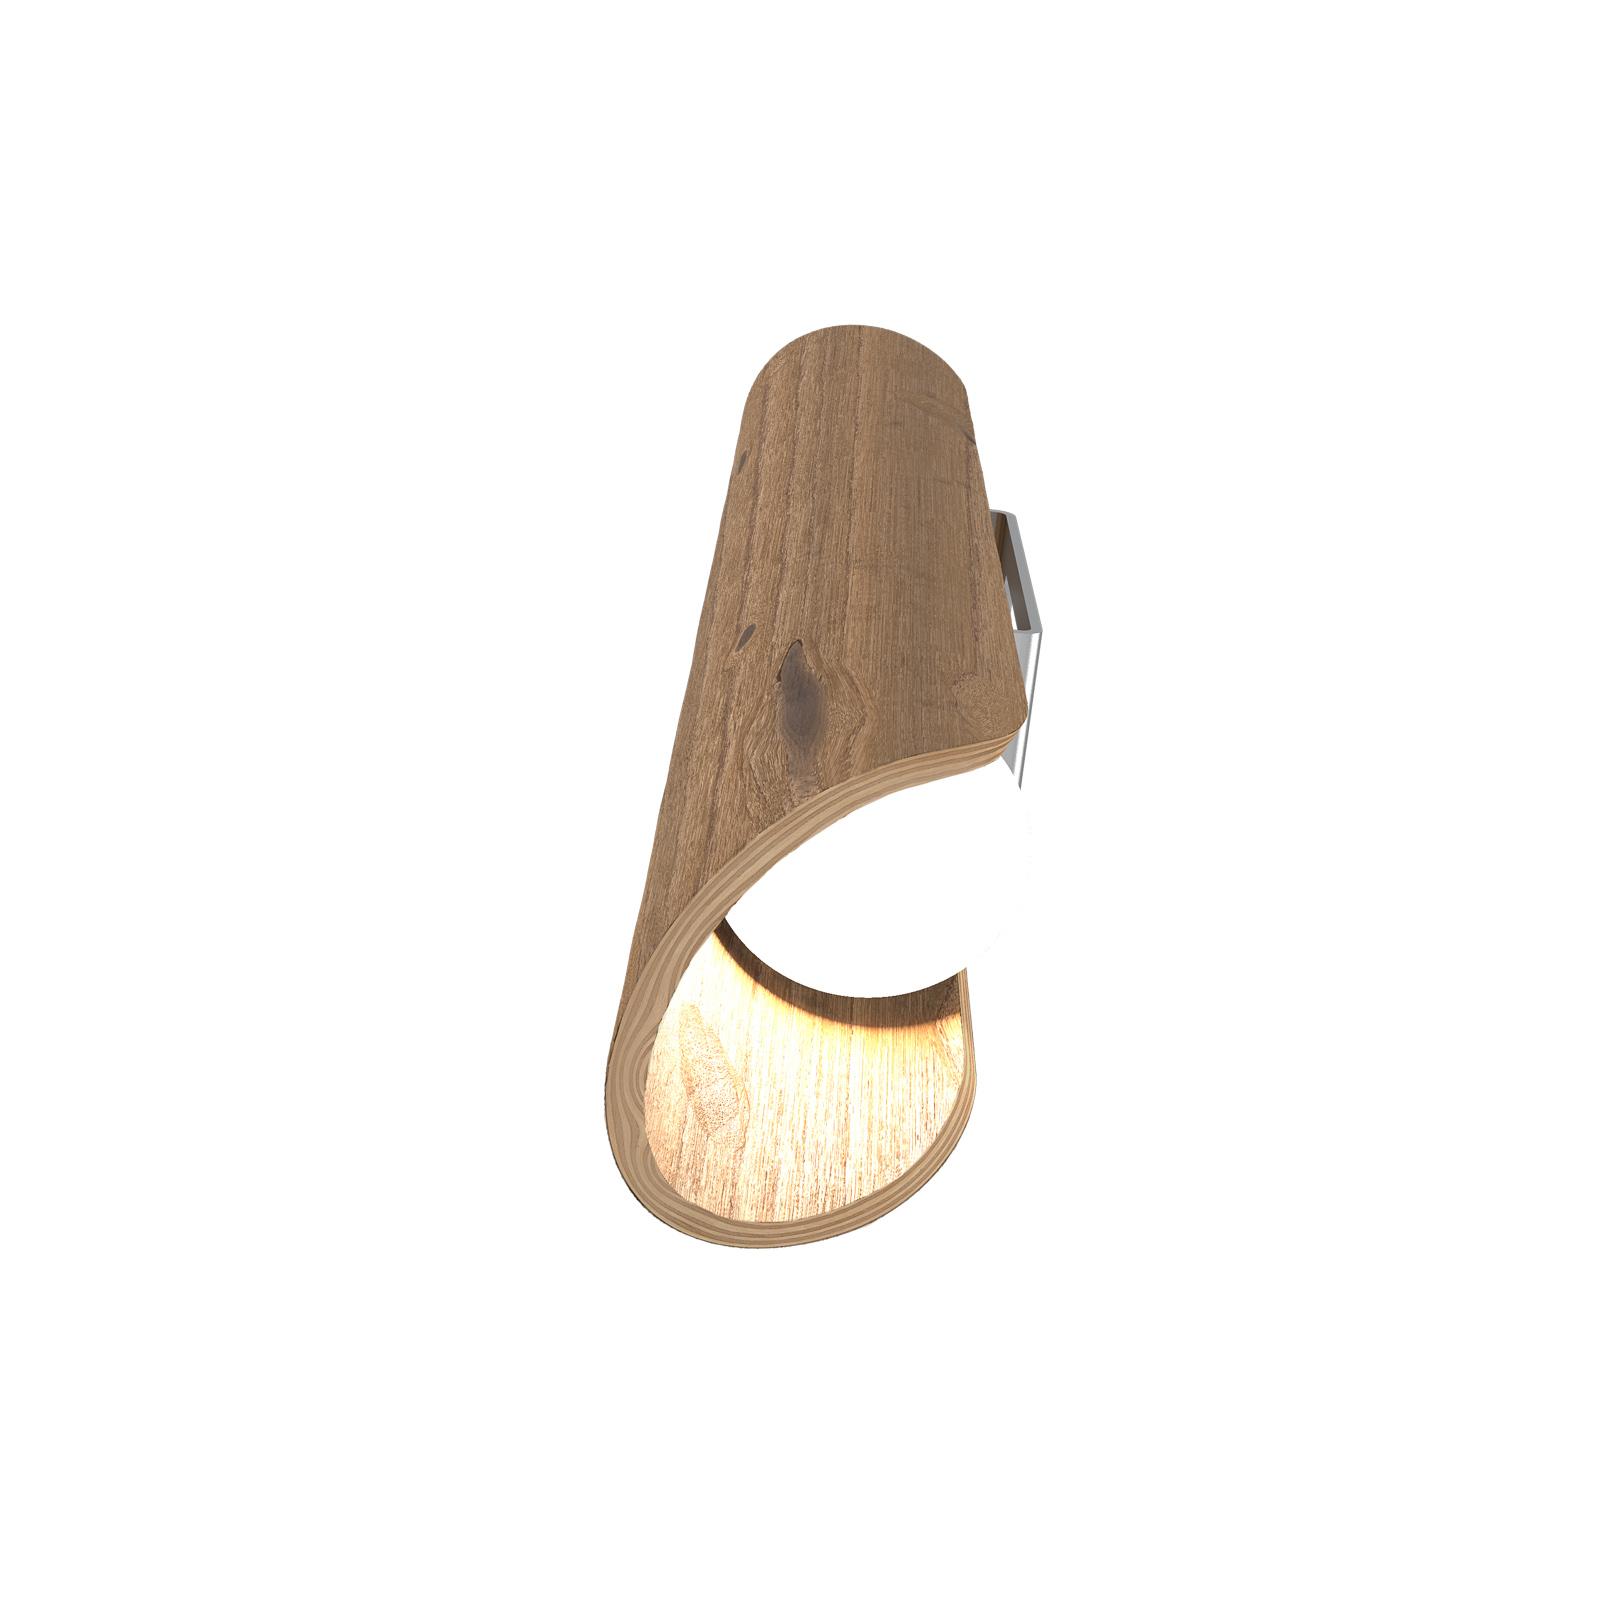 LED wandlamp Colombia, asteiken natuur